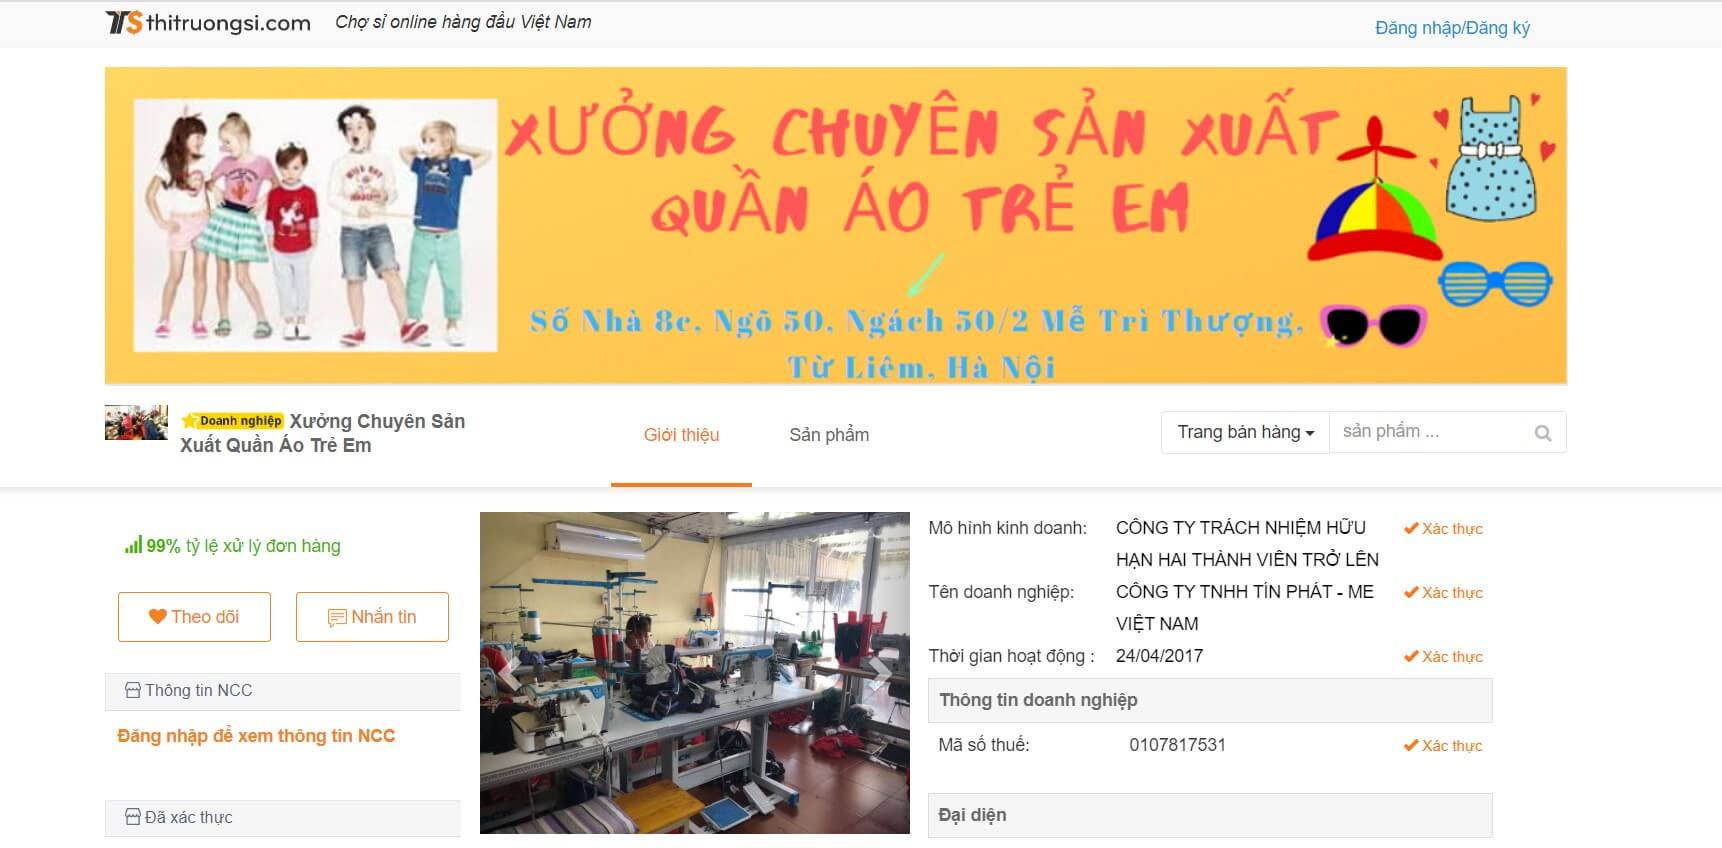 thitruongsi.com_shopxuongmayoanhphuong